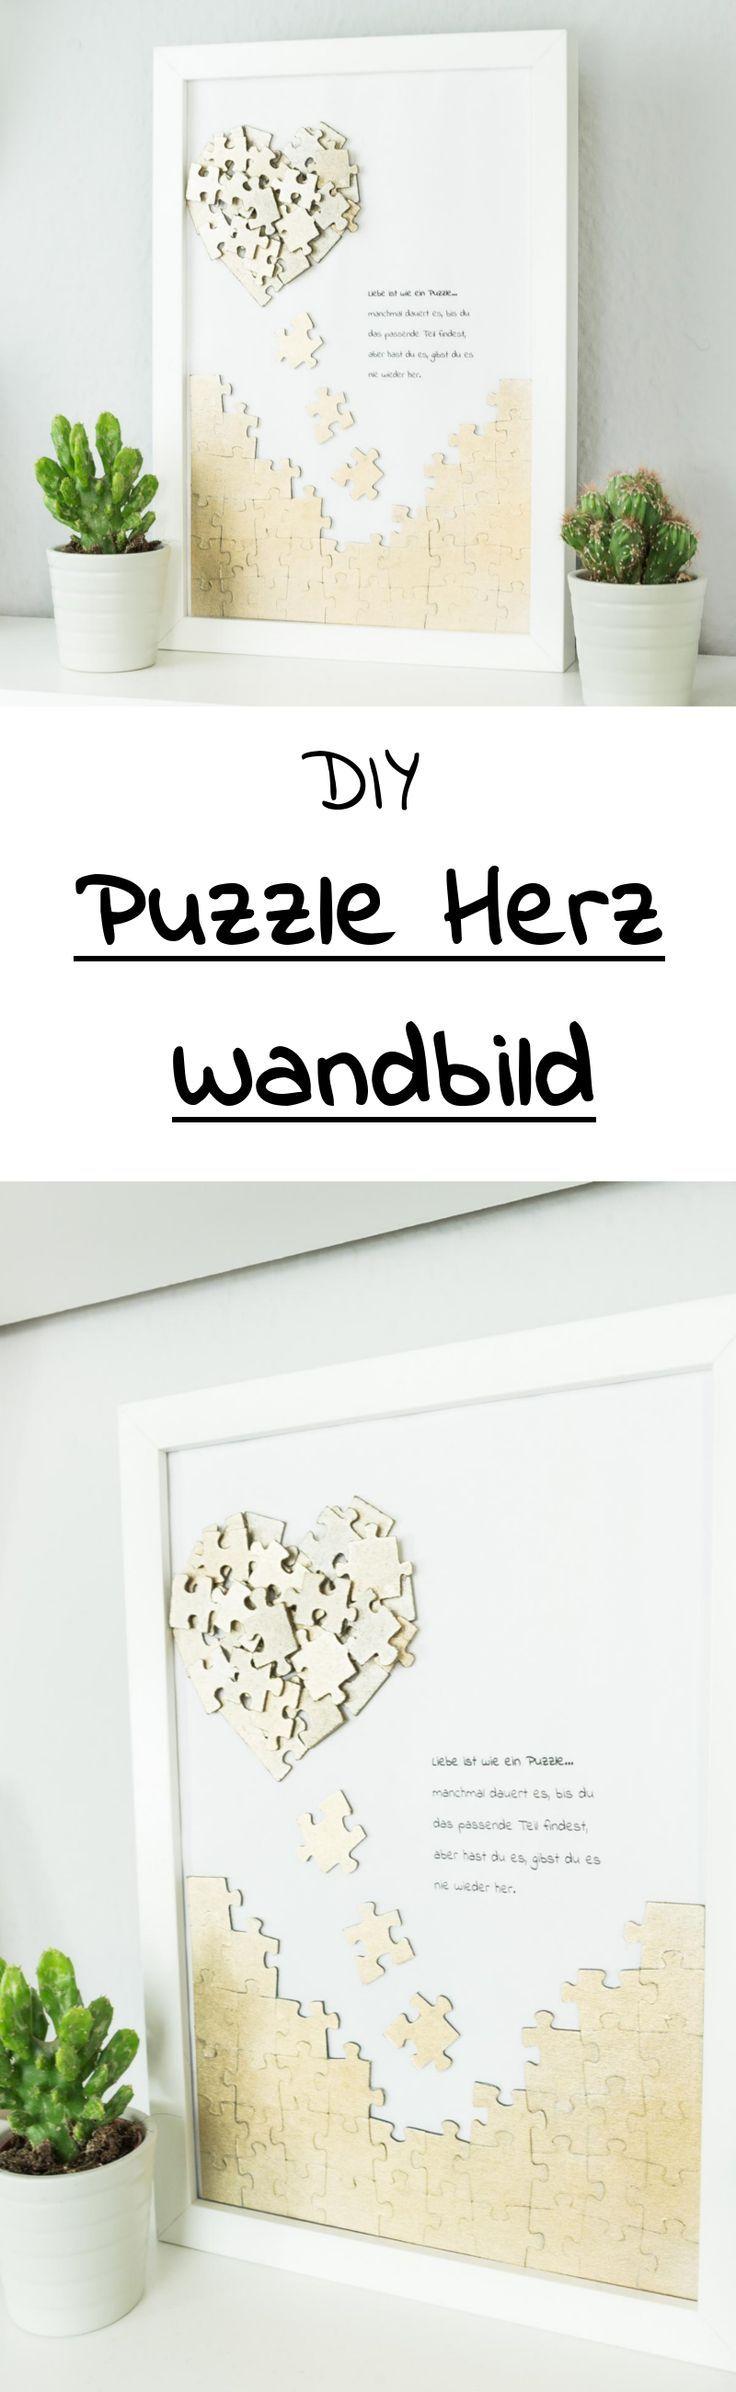 Puzzle Herz Wandbild basteln  schöne DIY Geschenkidee Puzzle Herz Wandbild basteln  schöne DIY Geschenkidee